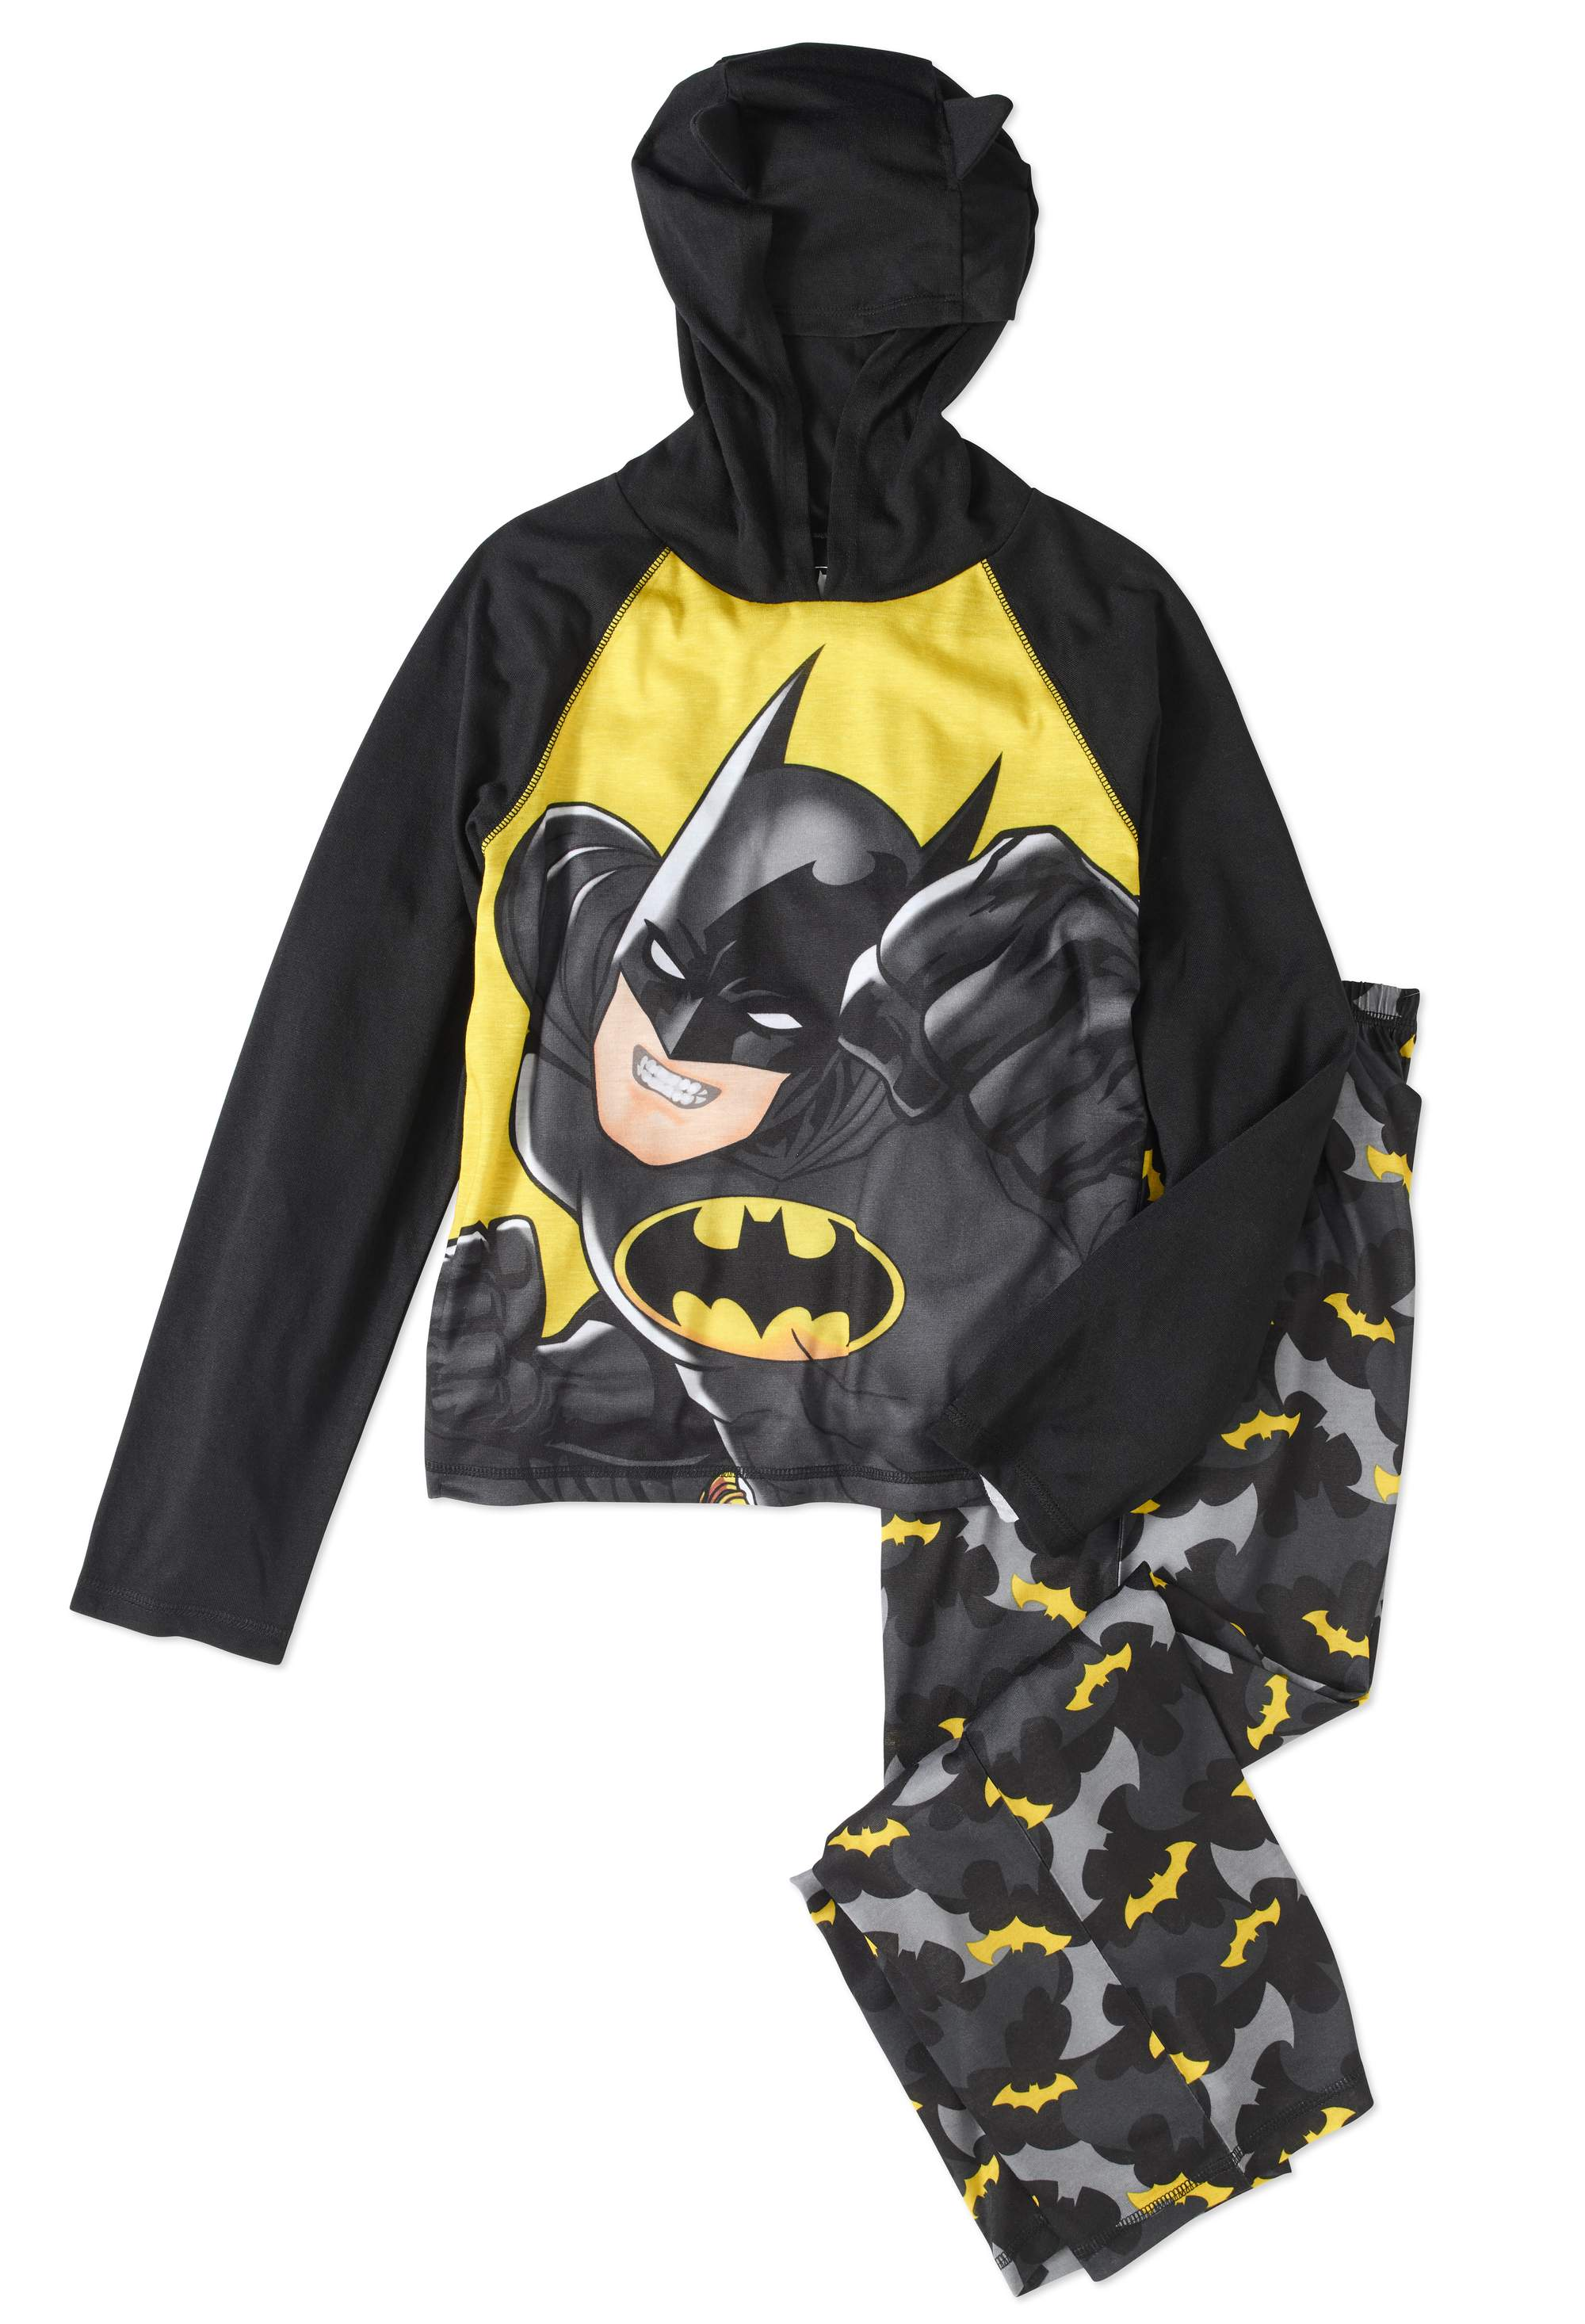 Batman Boys' 2pc Hooded Pajama Set by Komar Kids